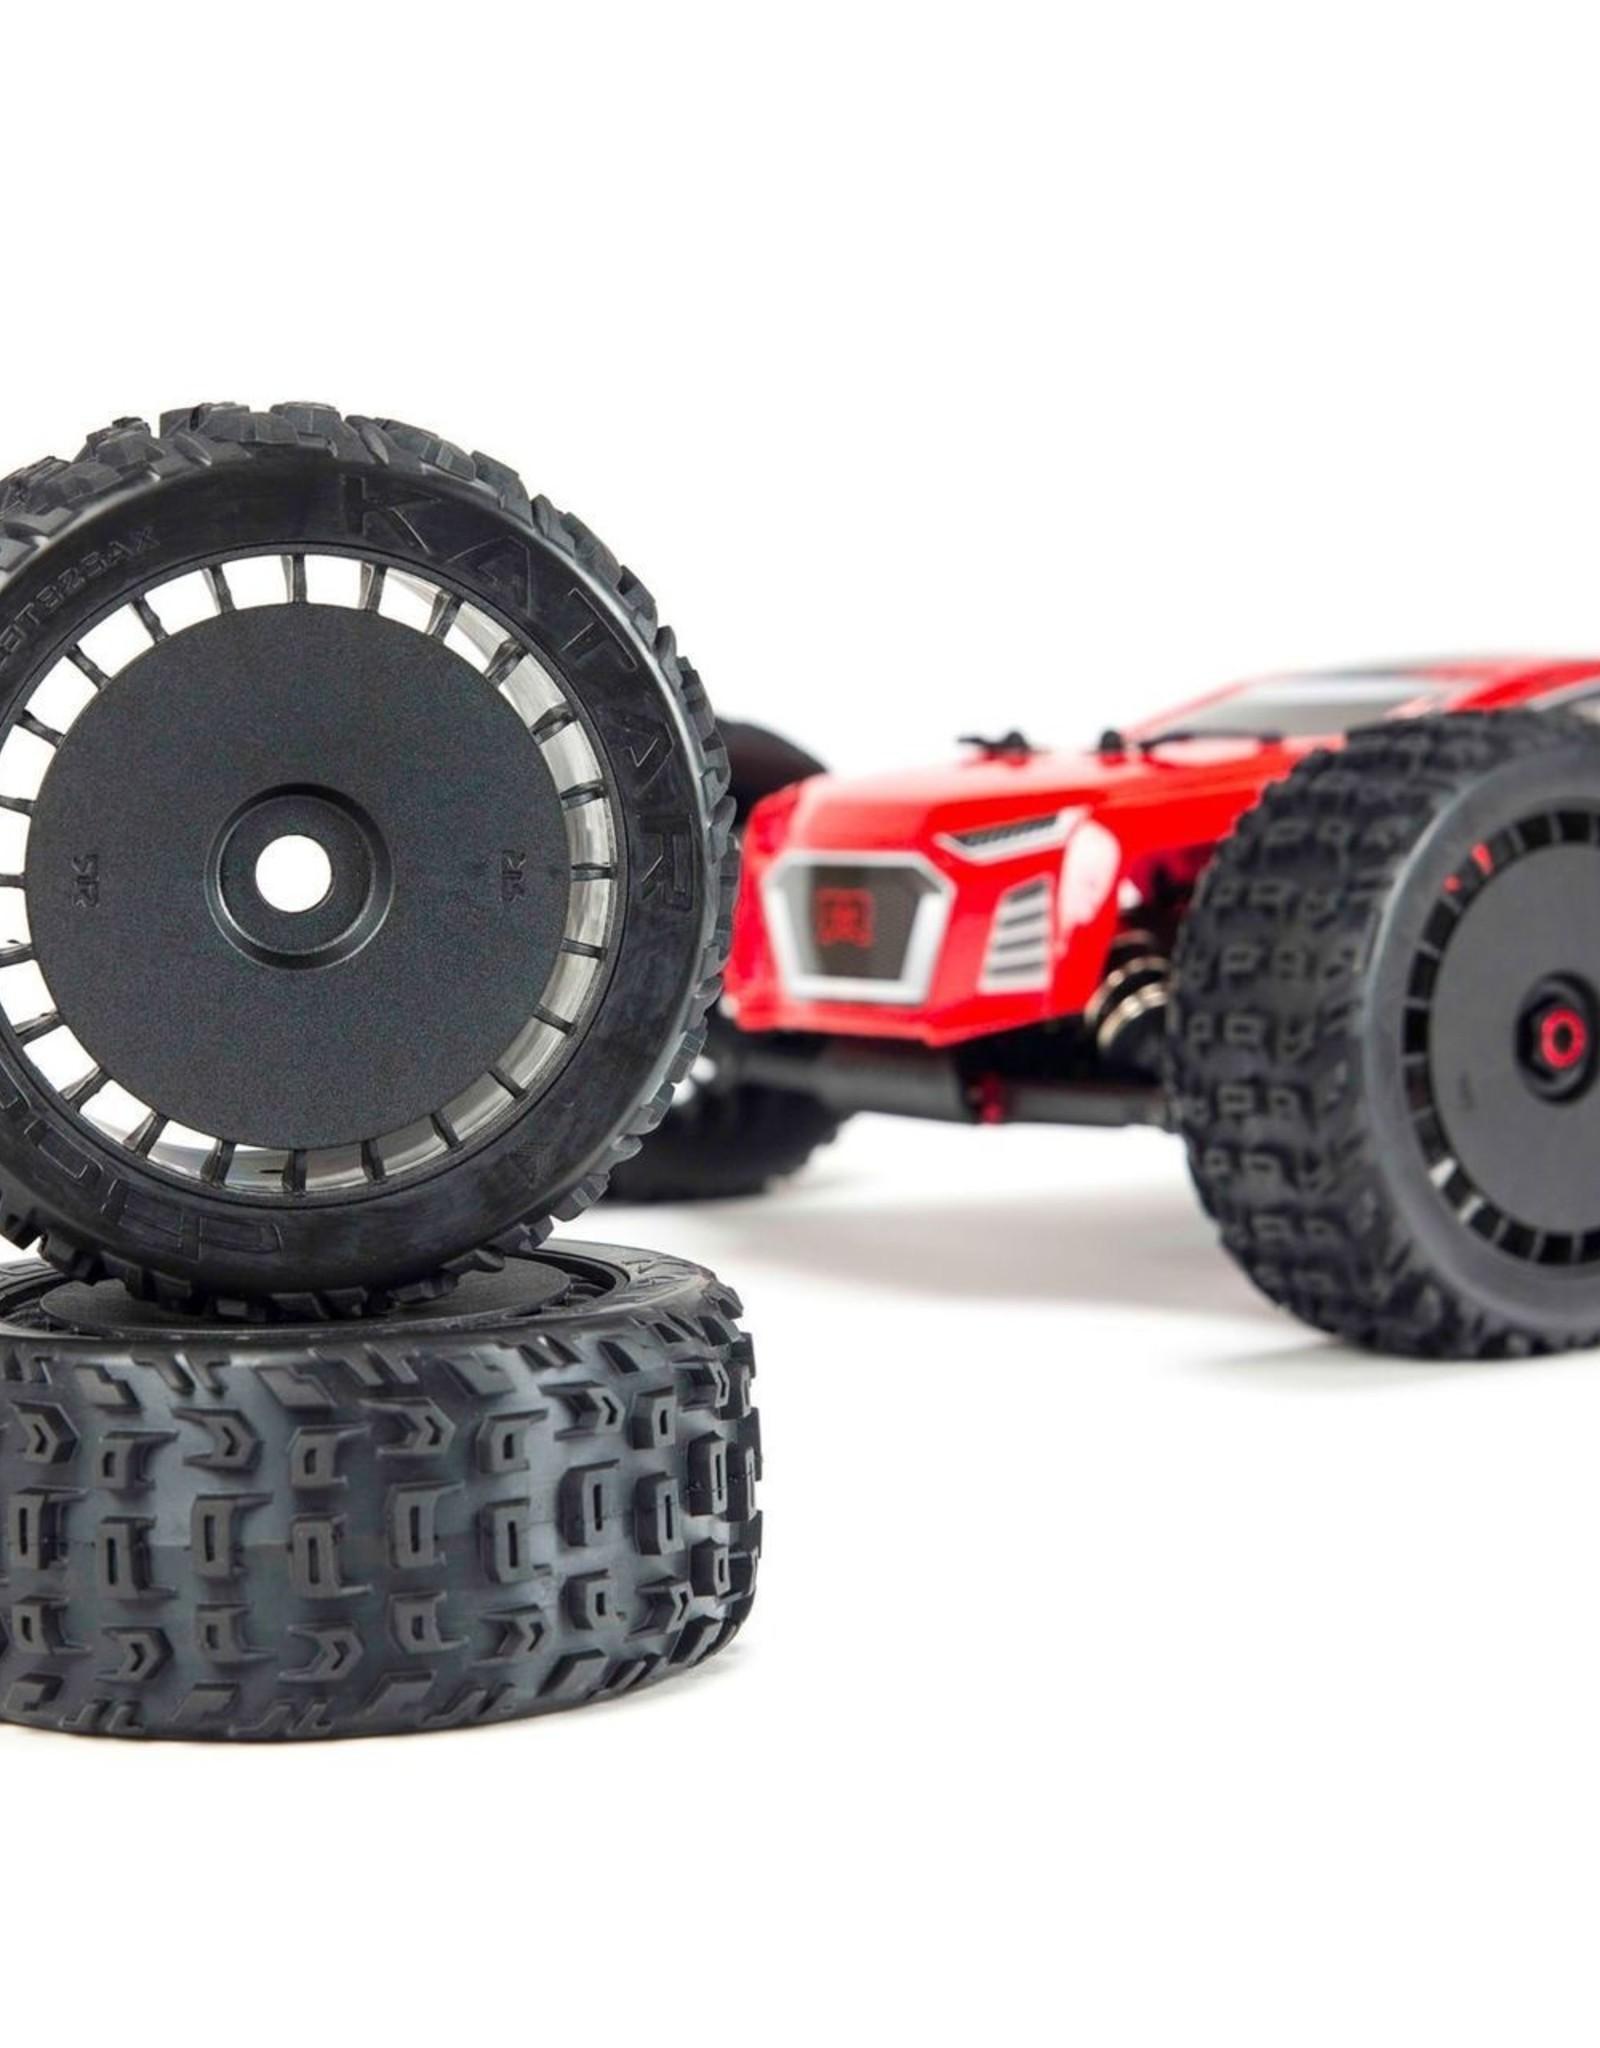 Arrma Arrma Talion 6S BLX 4WD Red/Black